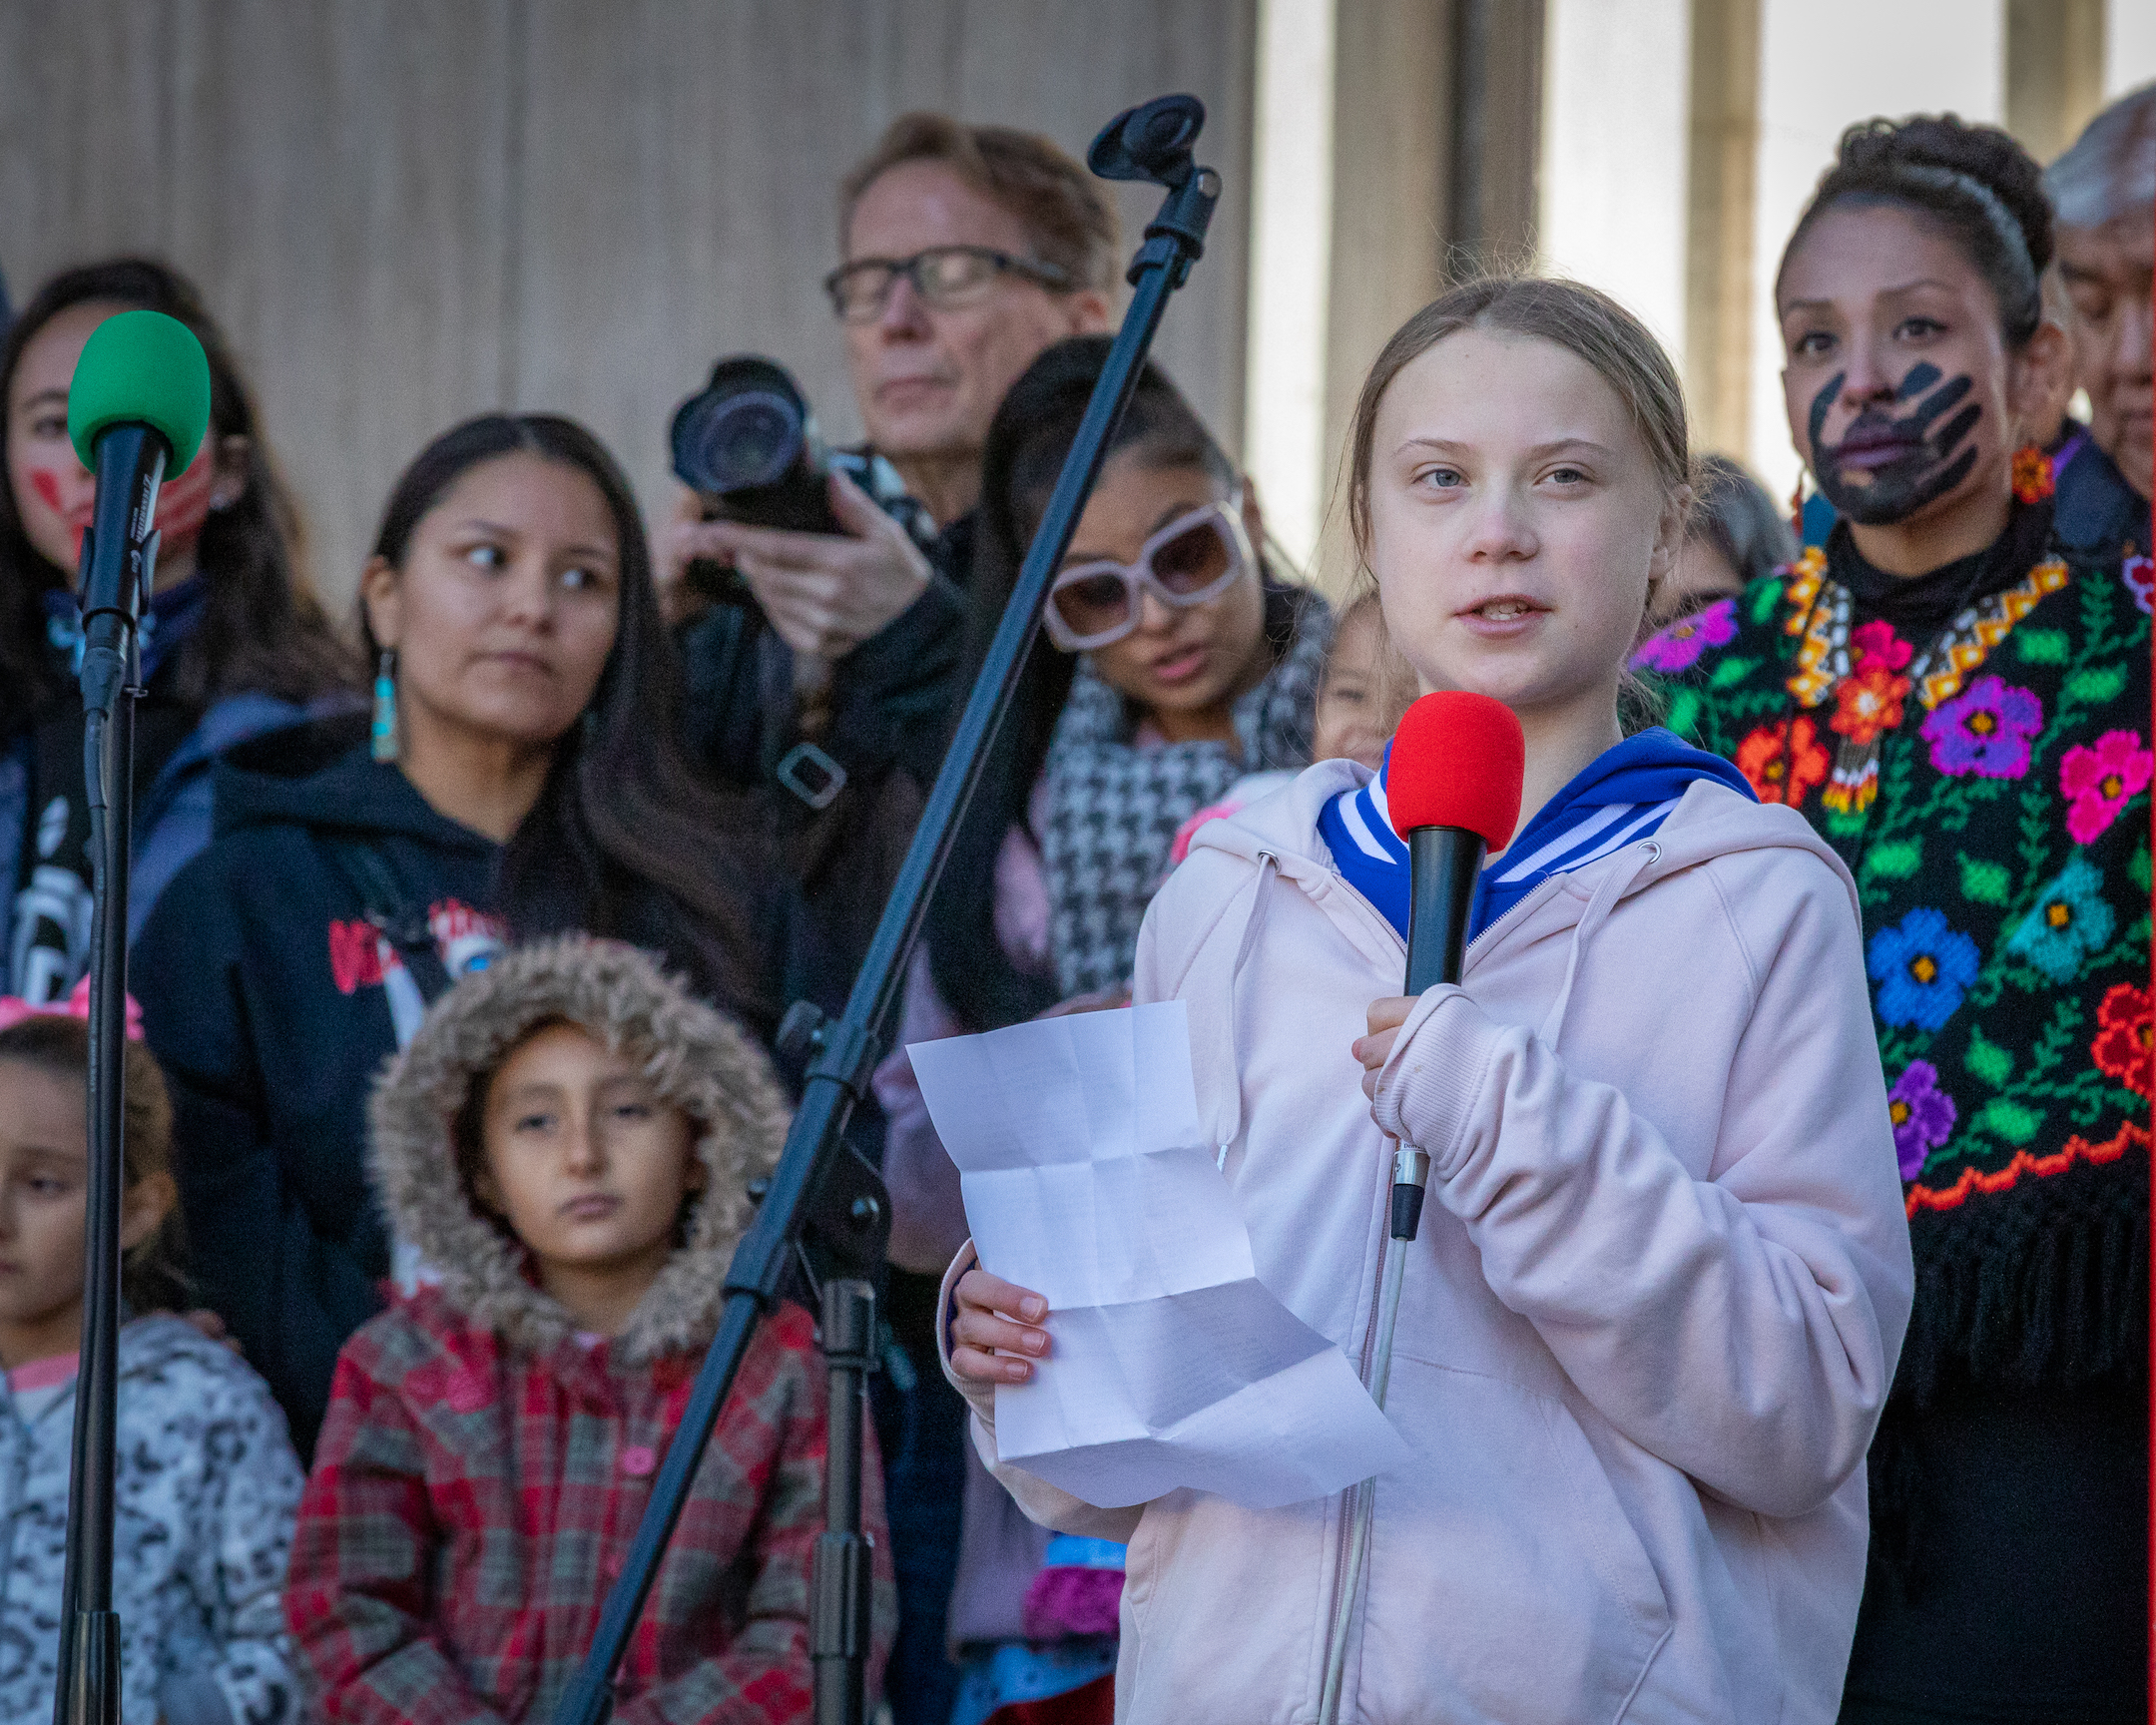 Ortiz Greta Thunberg Sticker Indicates Toxic Masculinity Rape